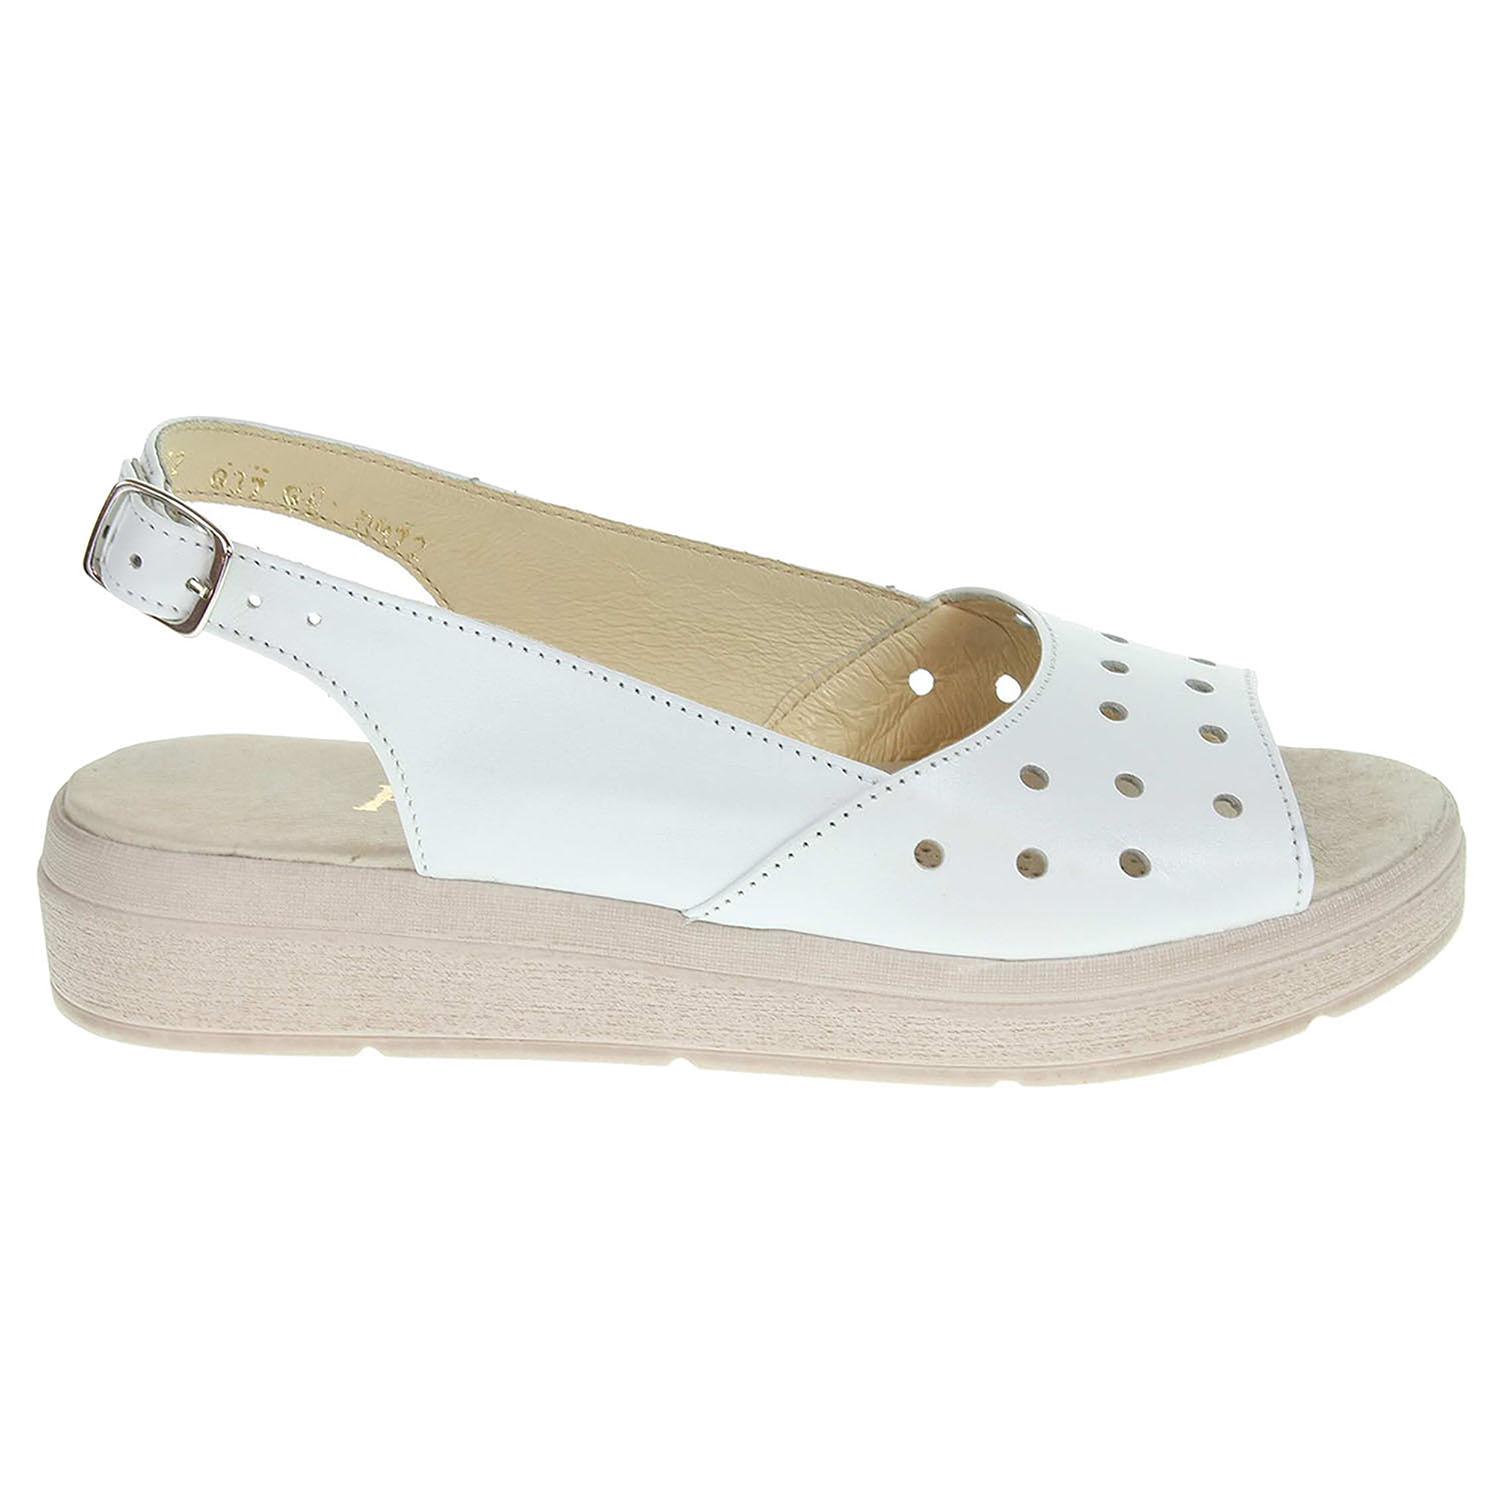 Ecco Dámské sandály J3472 bílé 23801096